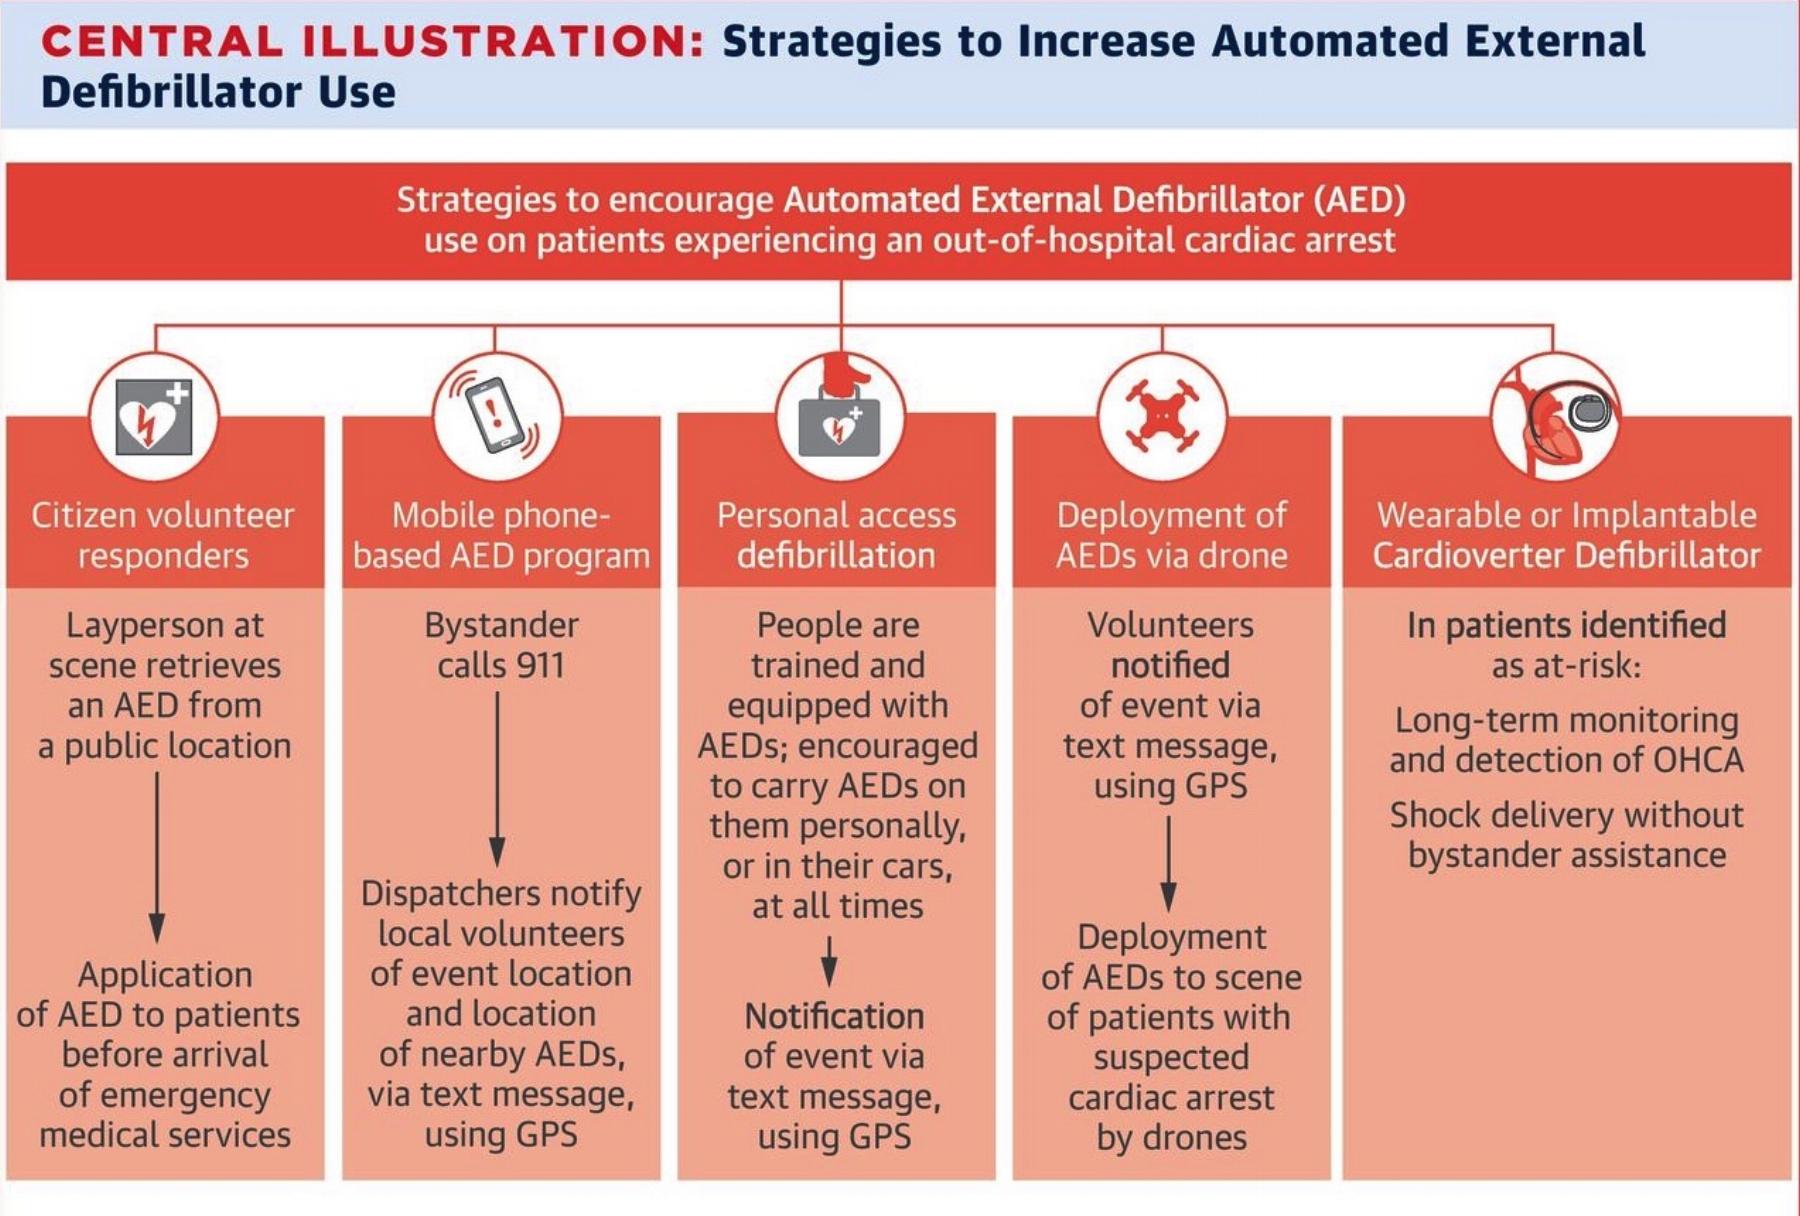 Strategies to increase AED use.jpg